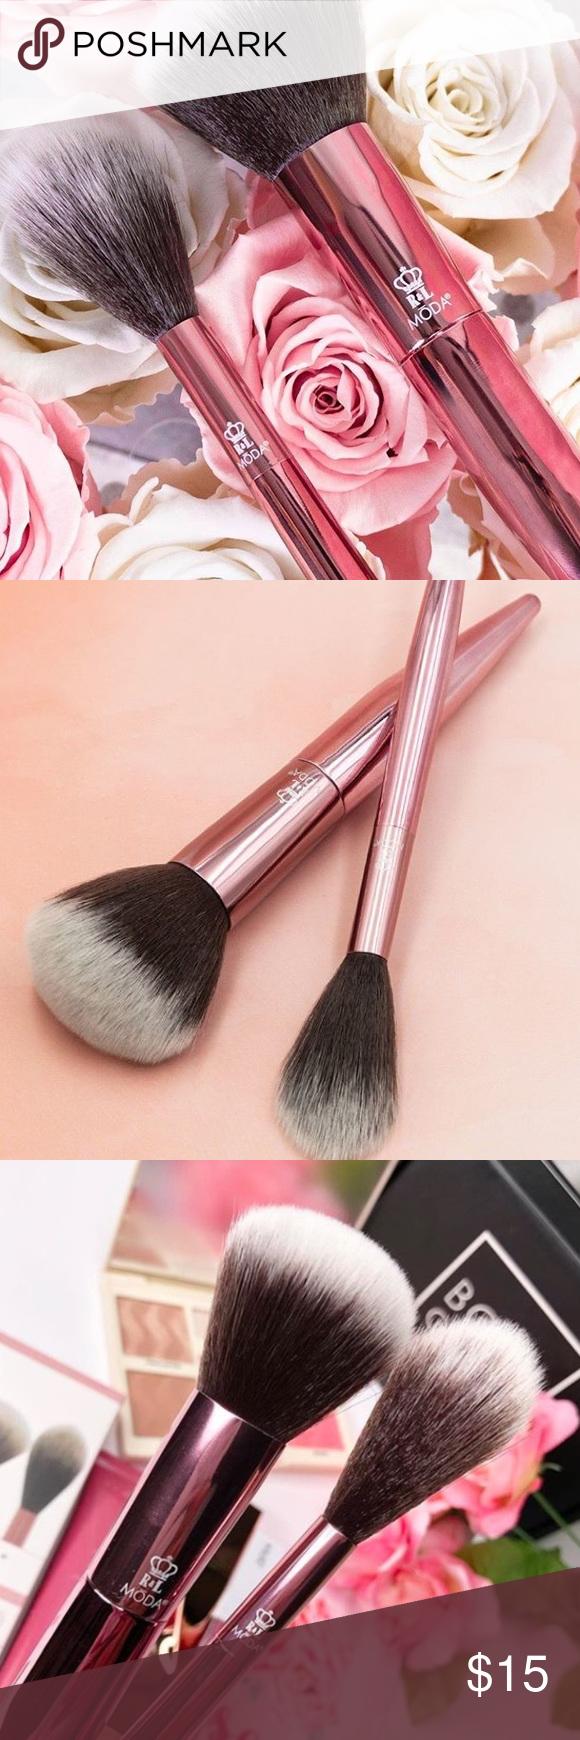 Moda Brush Duo new in box! Makeup Brushes & Tools Moda